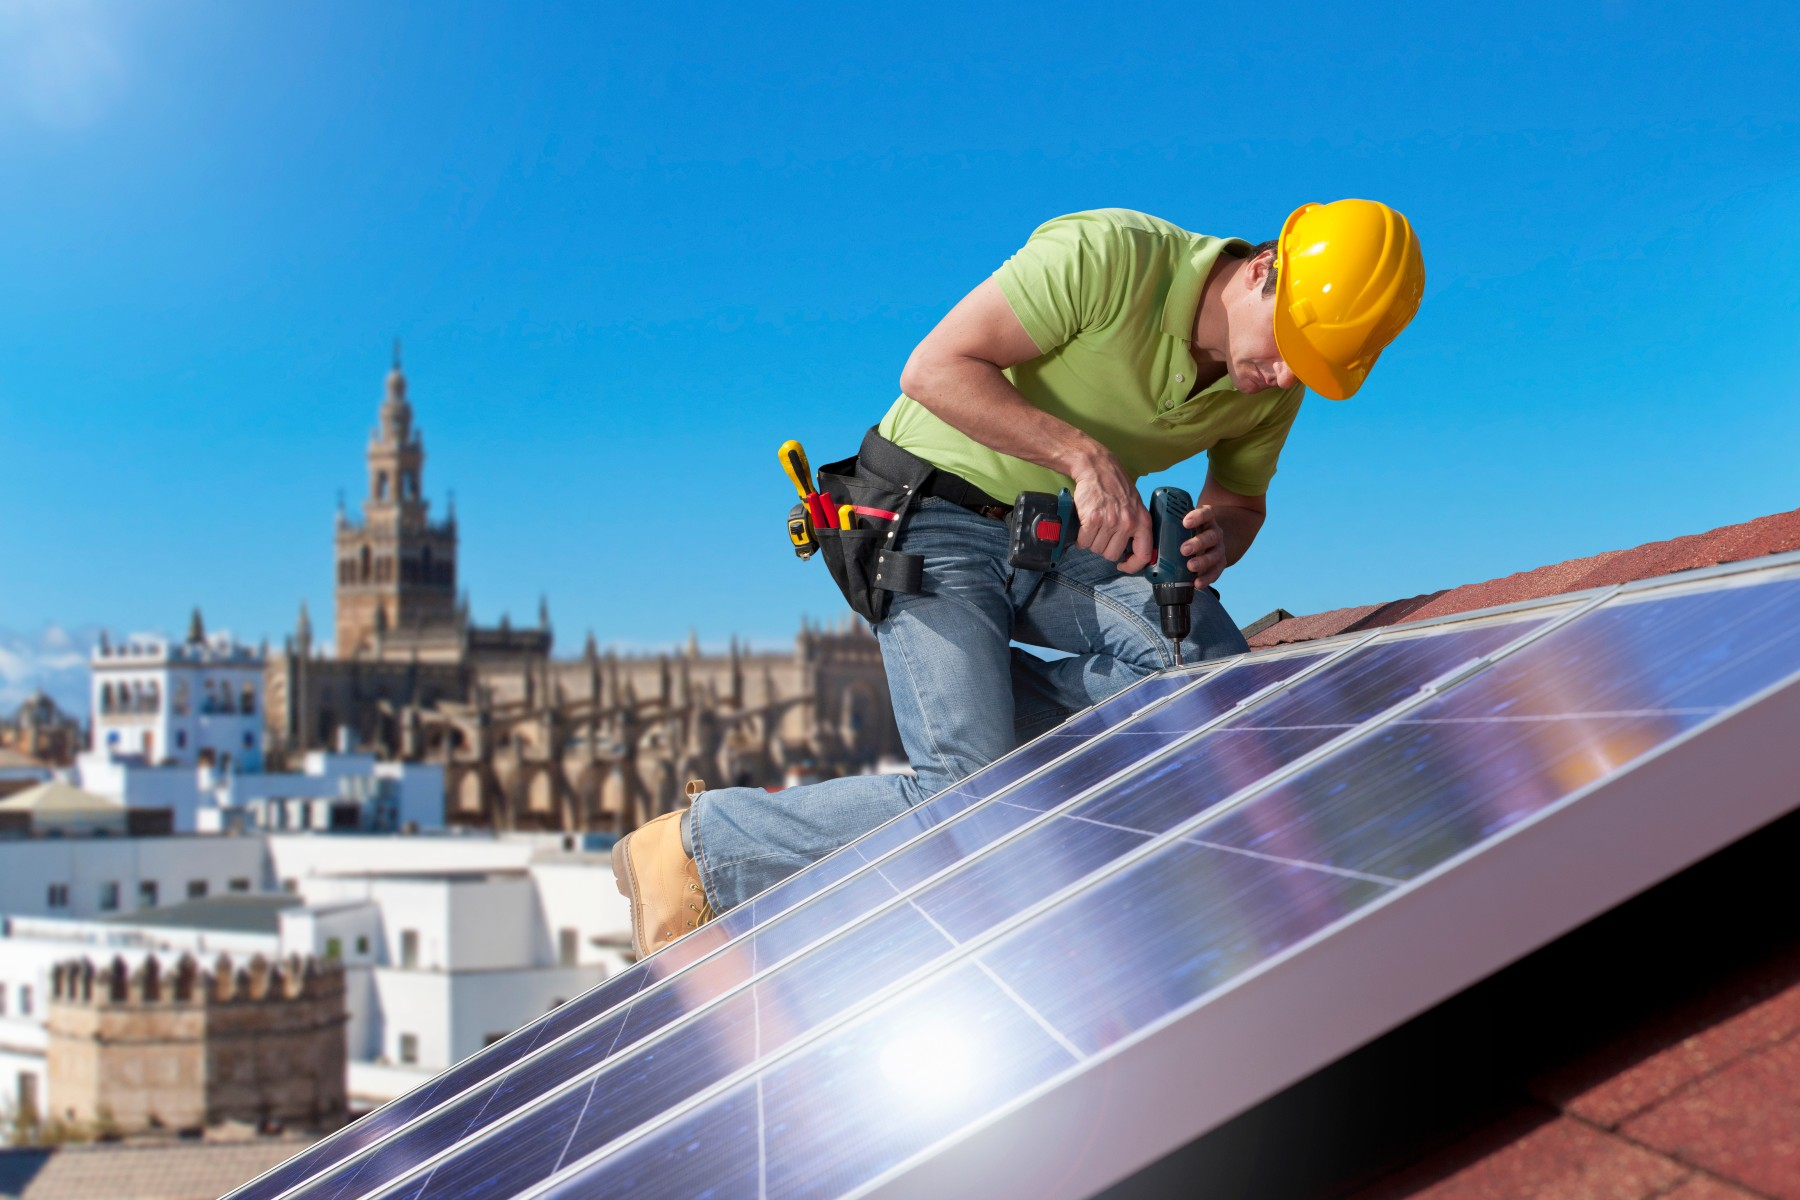 man installs solar panels on roof in Spain